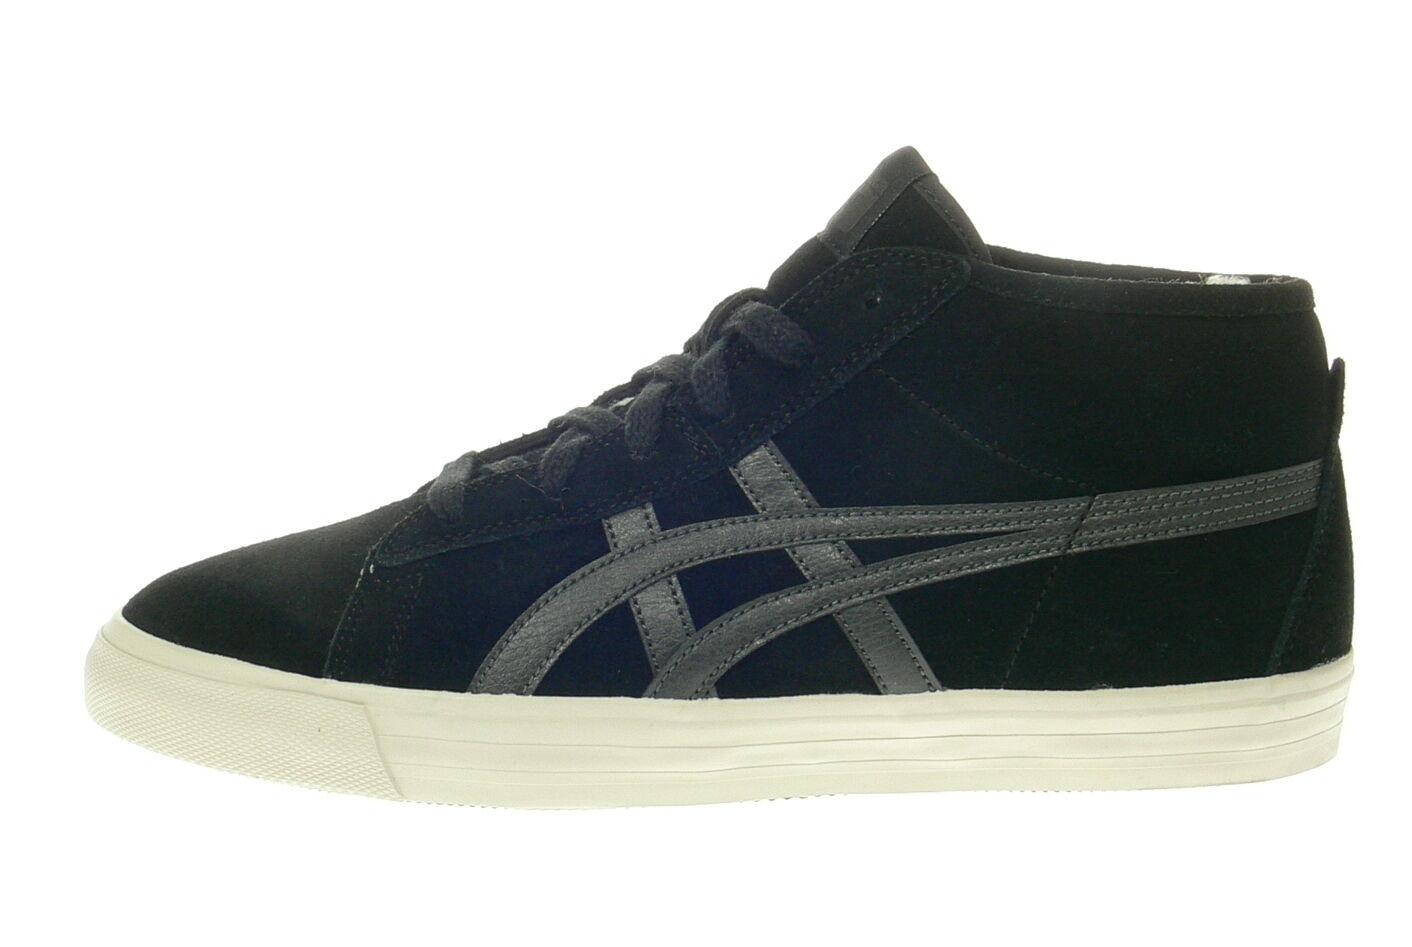 ASICS**Schuhe NEU Sneaker FADER D31RK 9016 black Onitsuka Tiger Echtleder